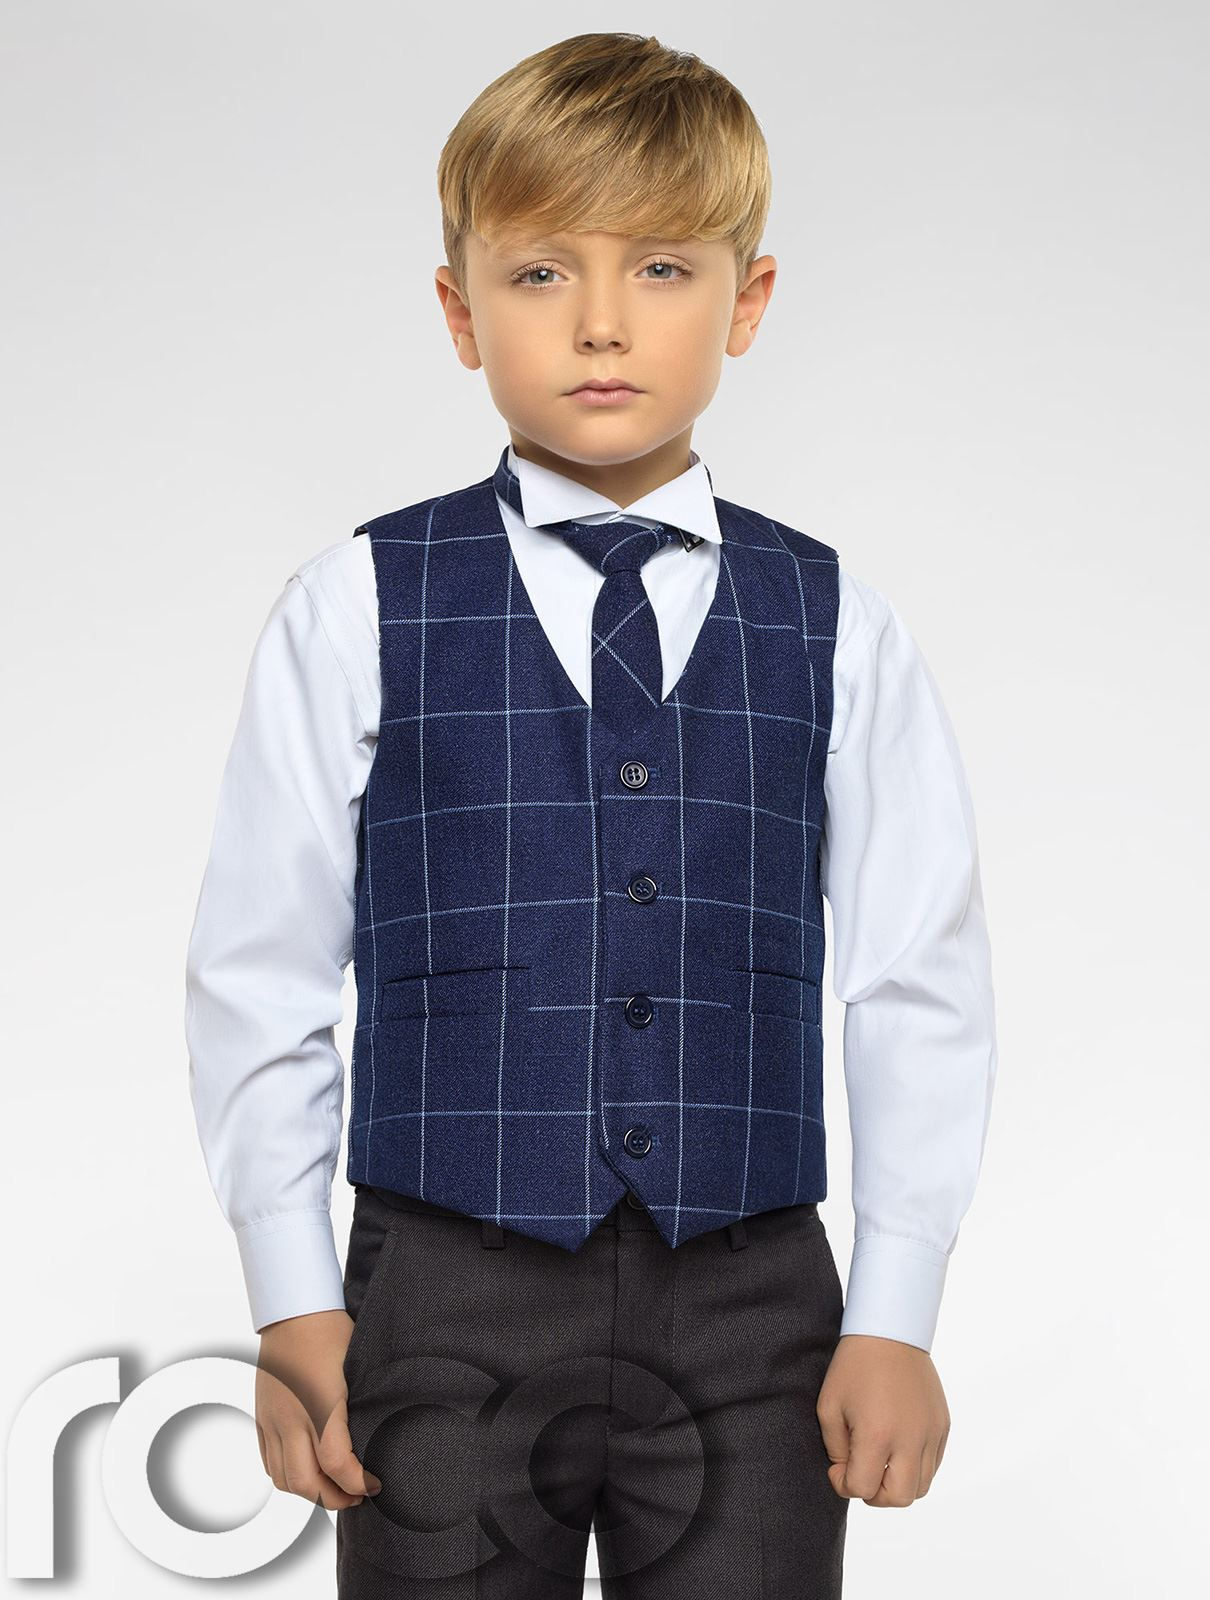 Boys Grey Suit, Boys Check Waistcoat, Page Boy Suits, Boys Wedding ...